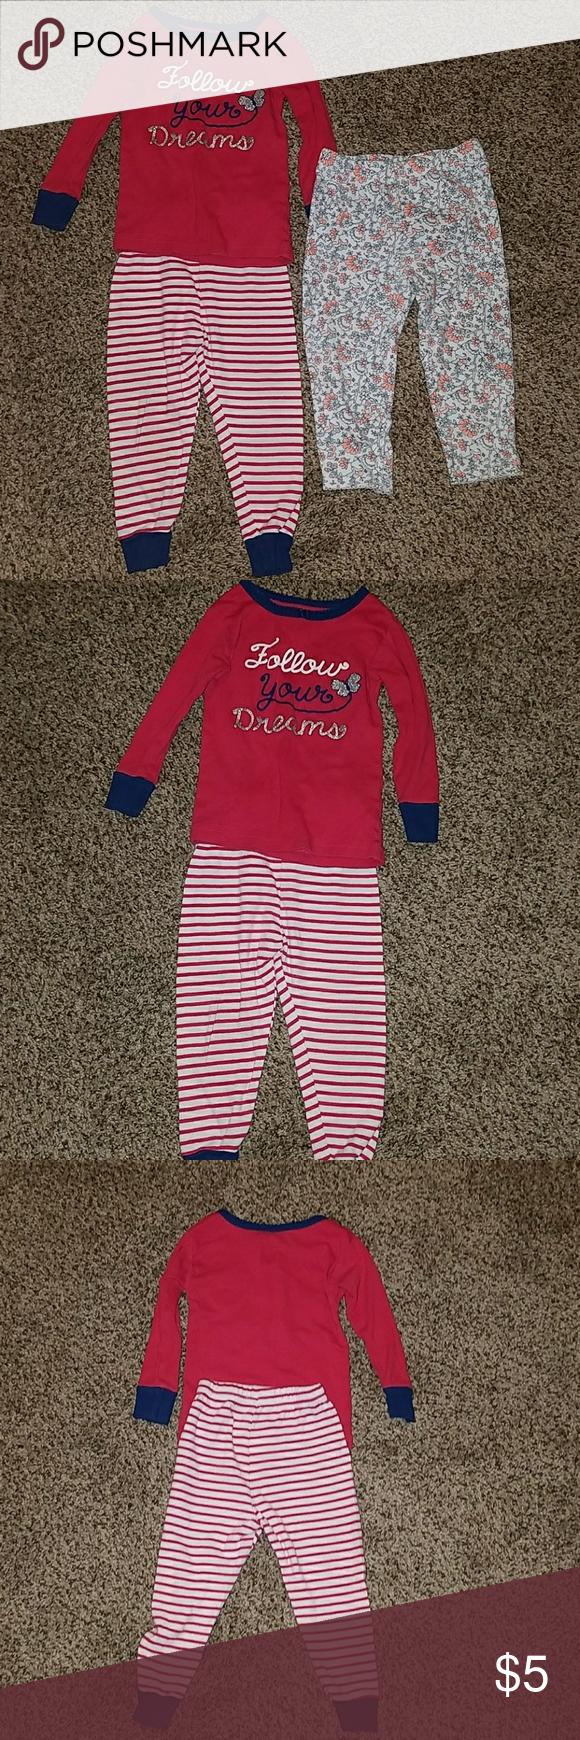 fa7ebad8c Baby girl 18mo pajama lot GUC baby girl pajamas. Red